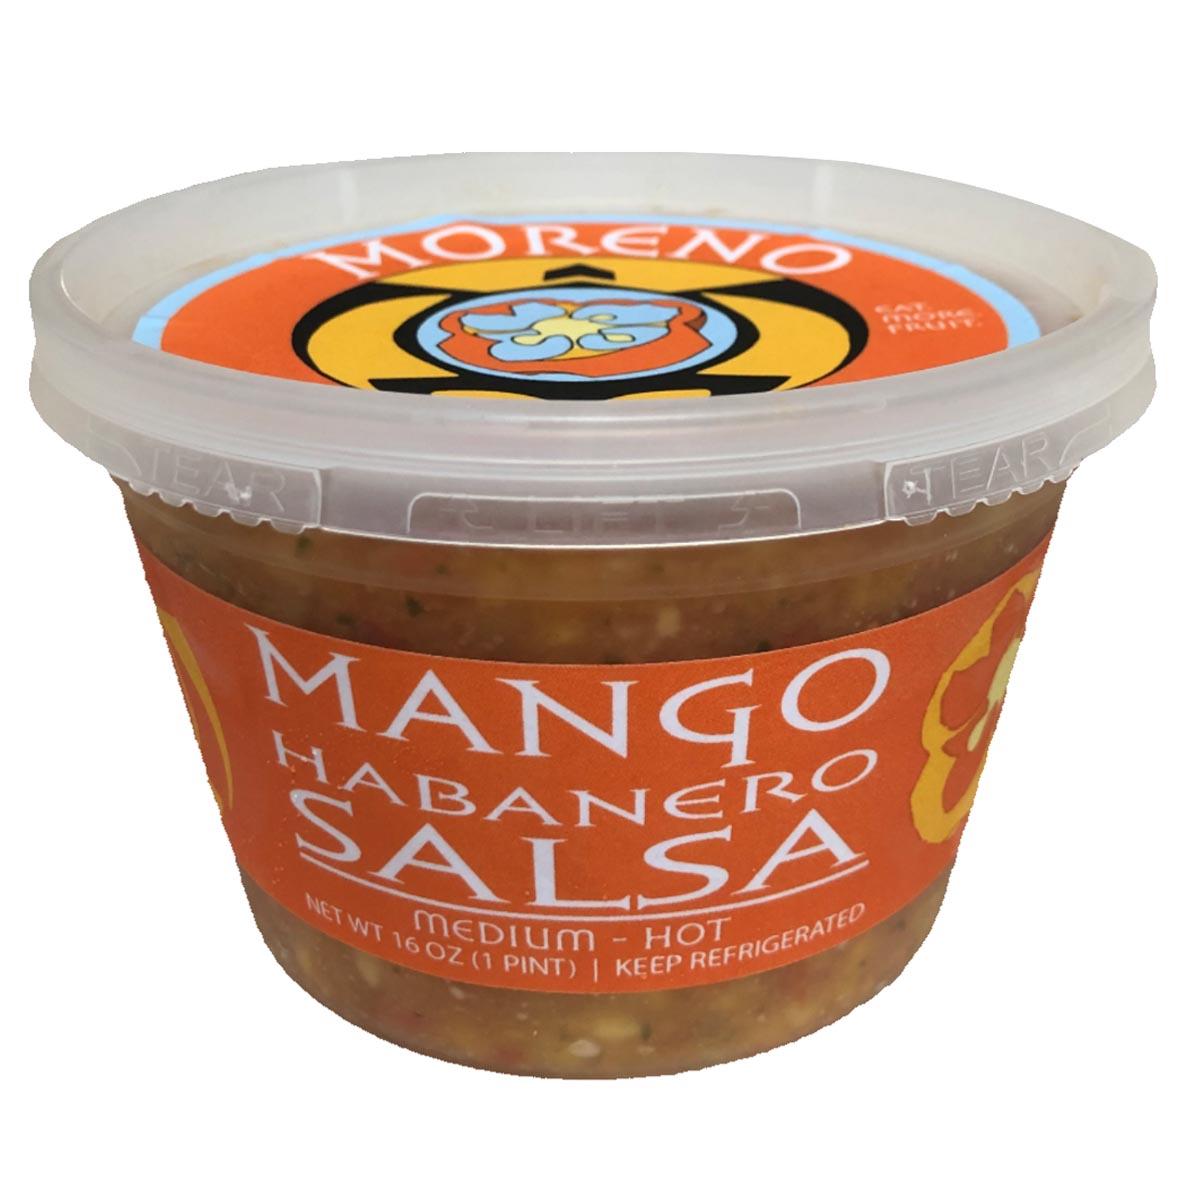 Mango Habanero Salsa 1 Square